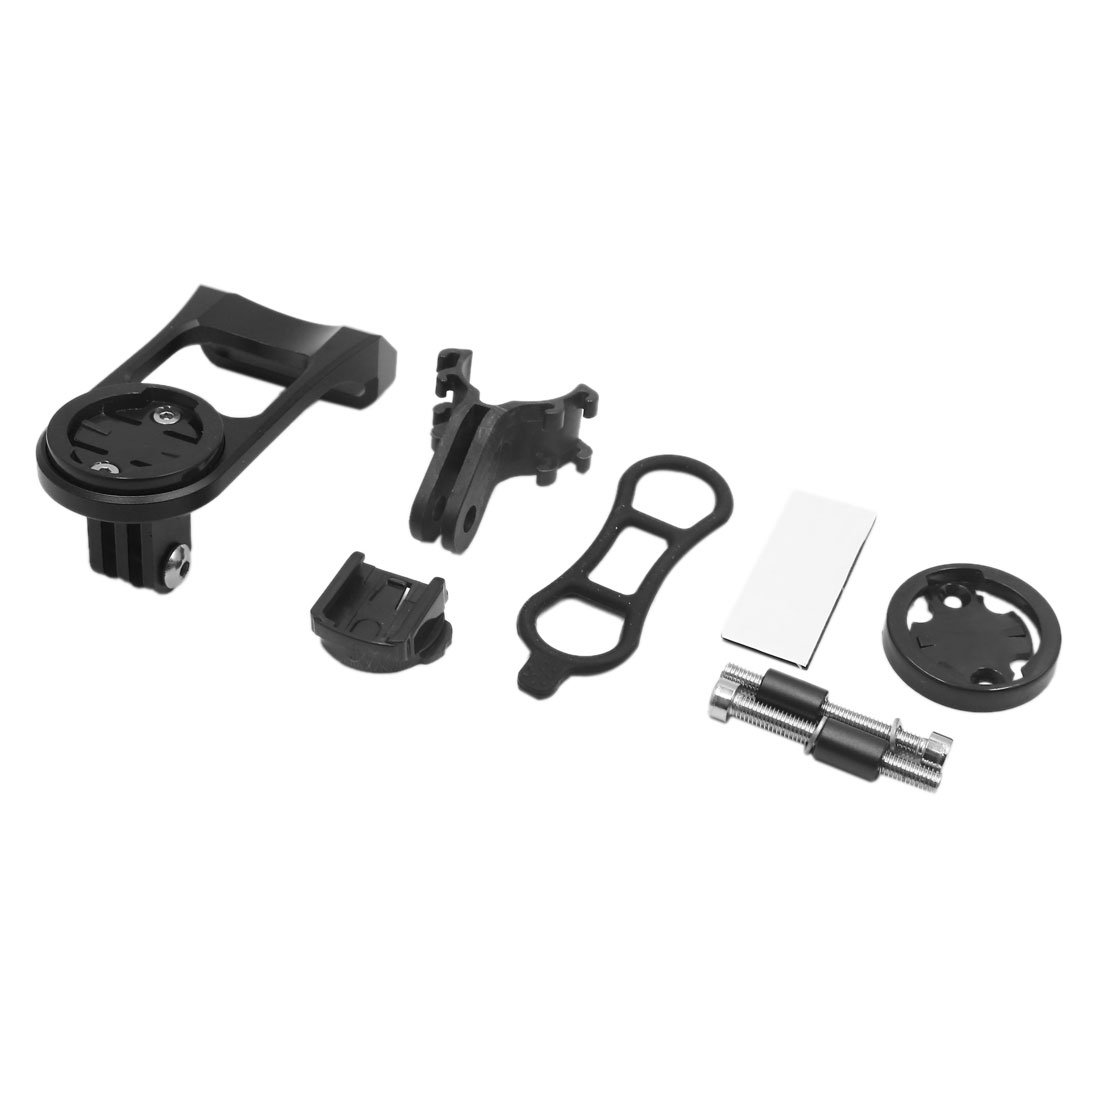 uxcell Black Cycling Bicycle Bike Computer GPS Extension Bracket Holder Stem Mount Kit